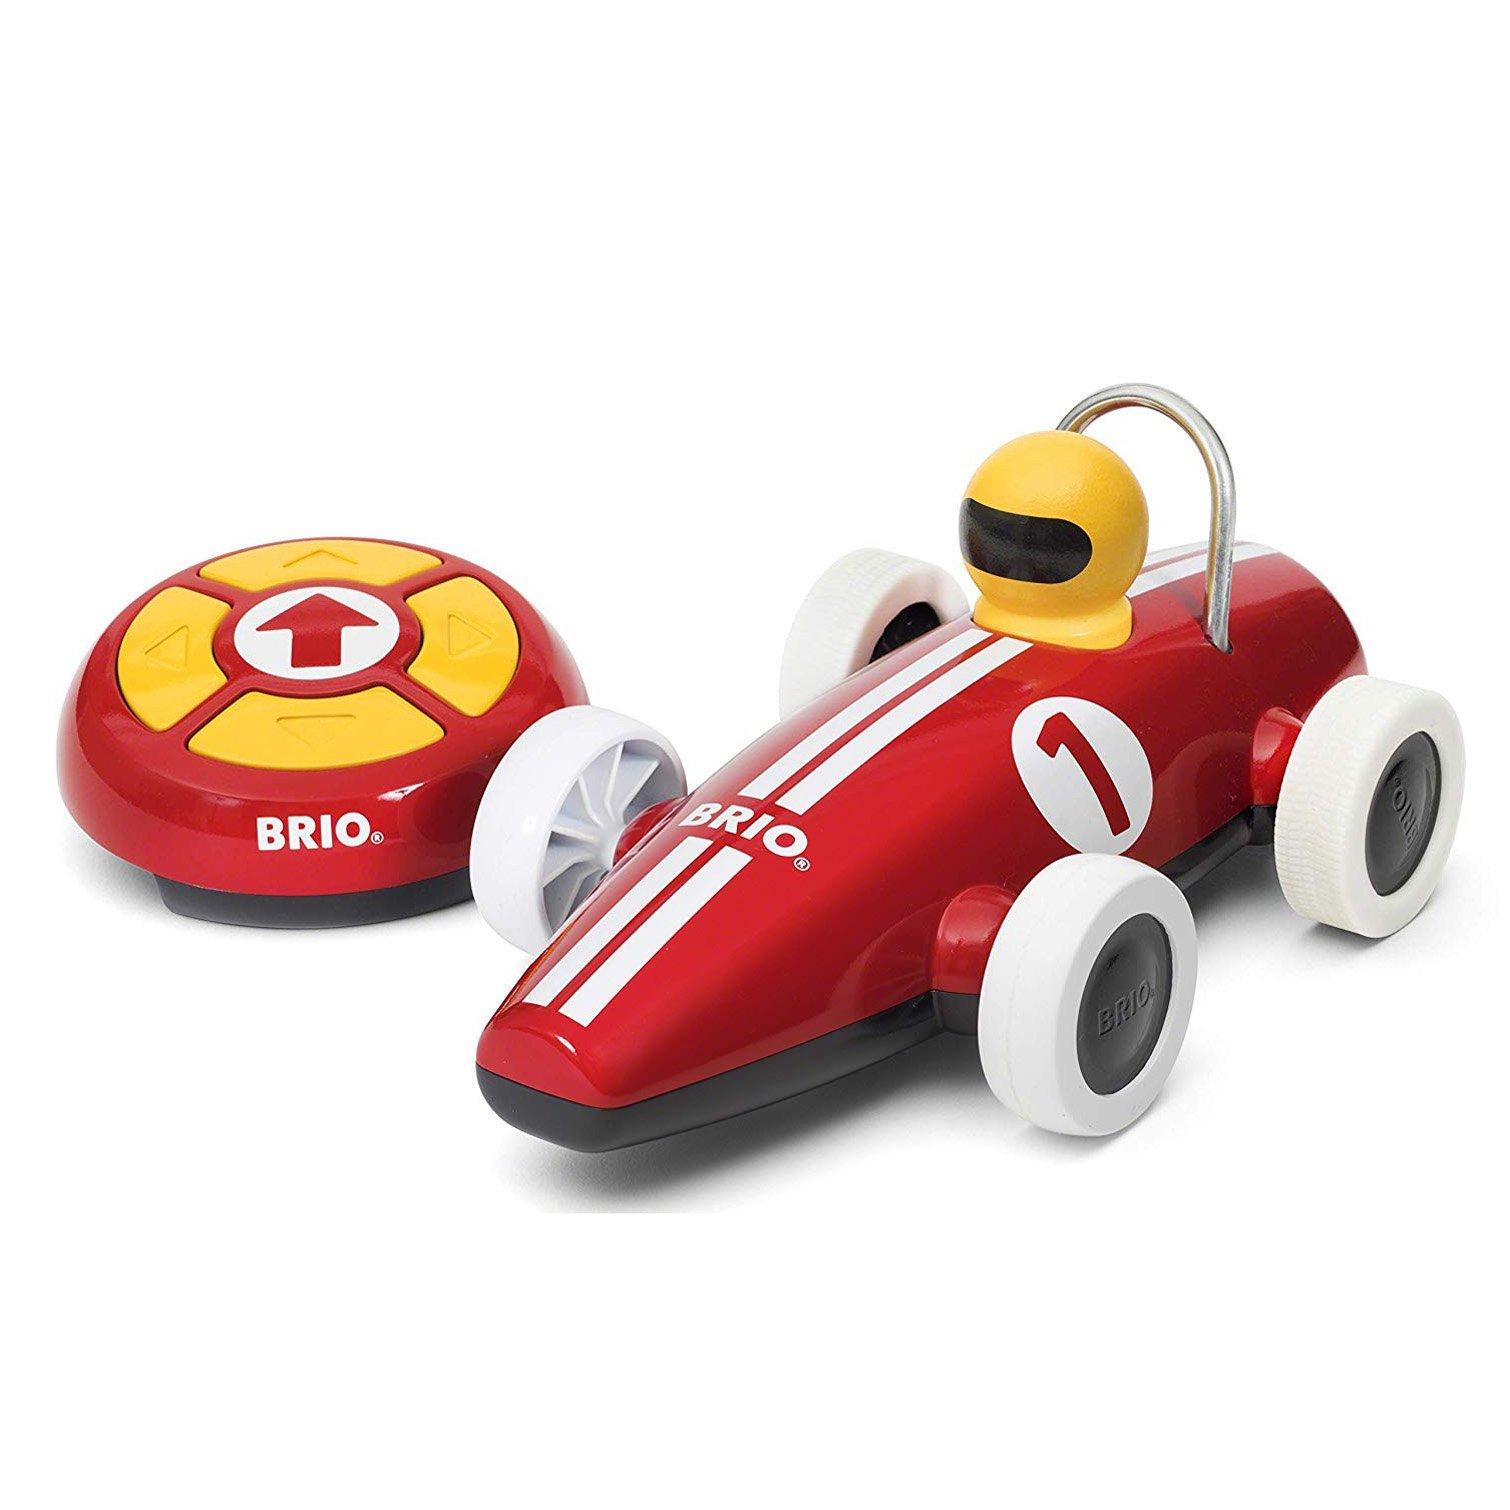 BRIO - R/C Race Car (30388)